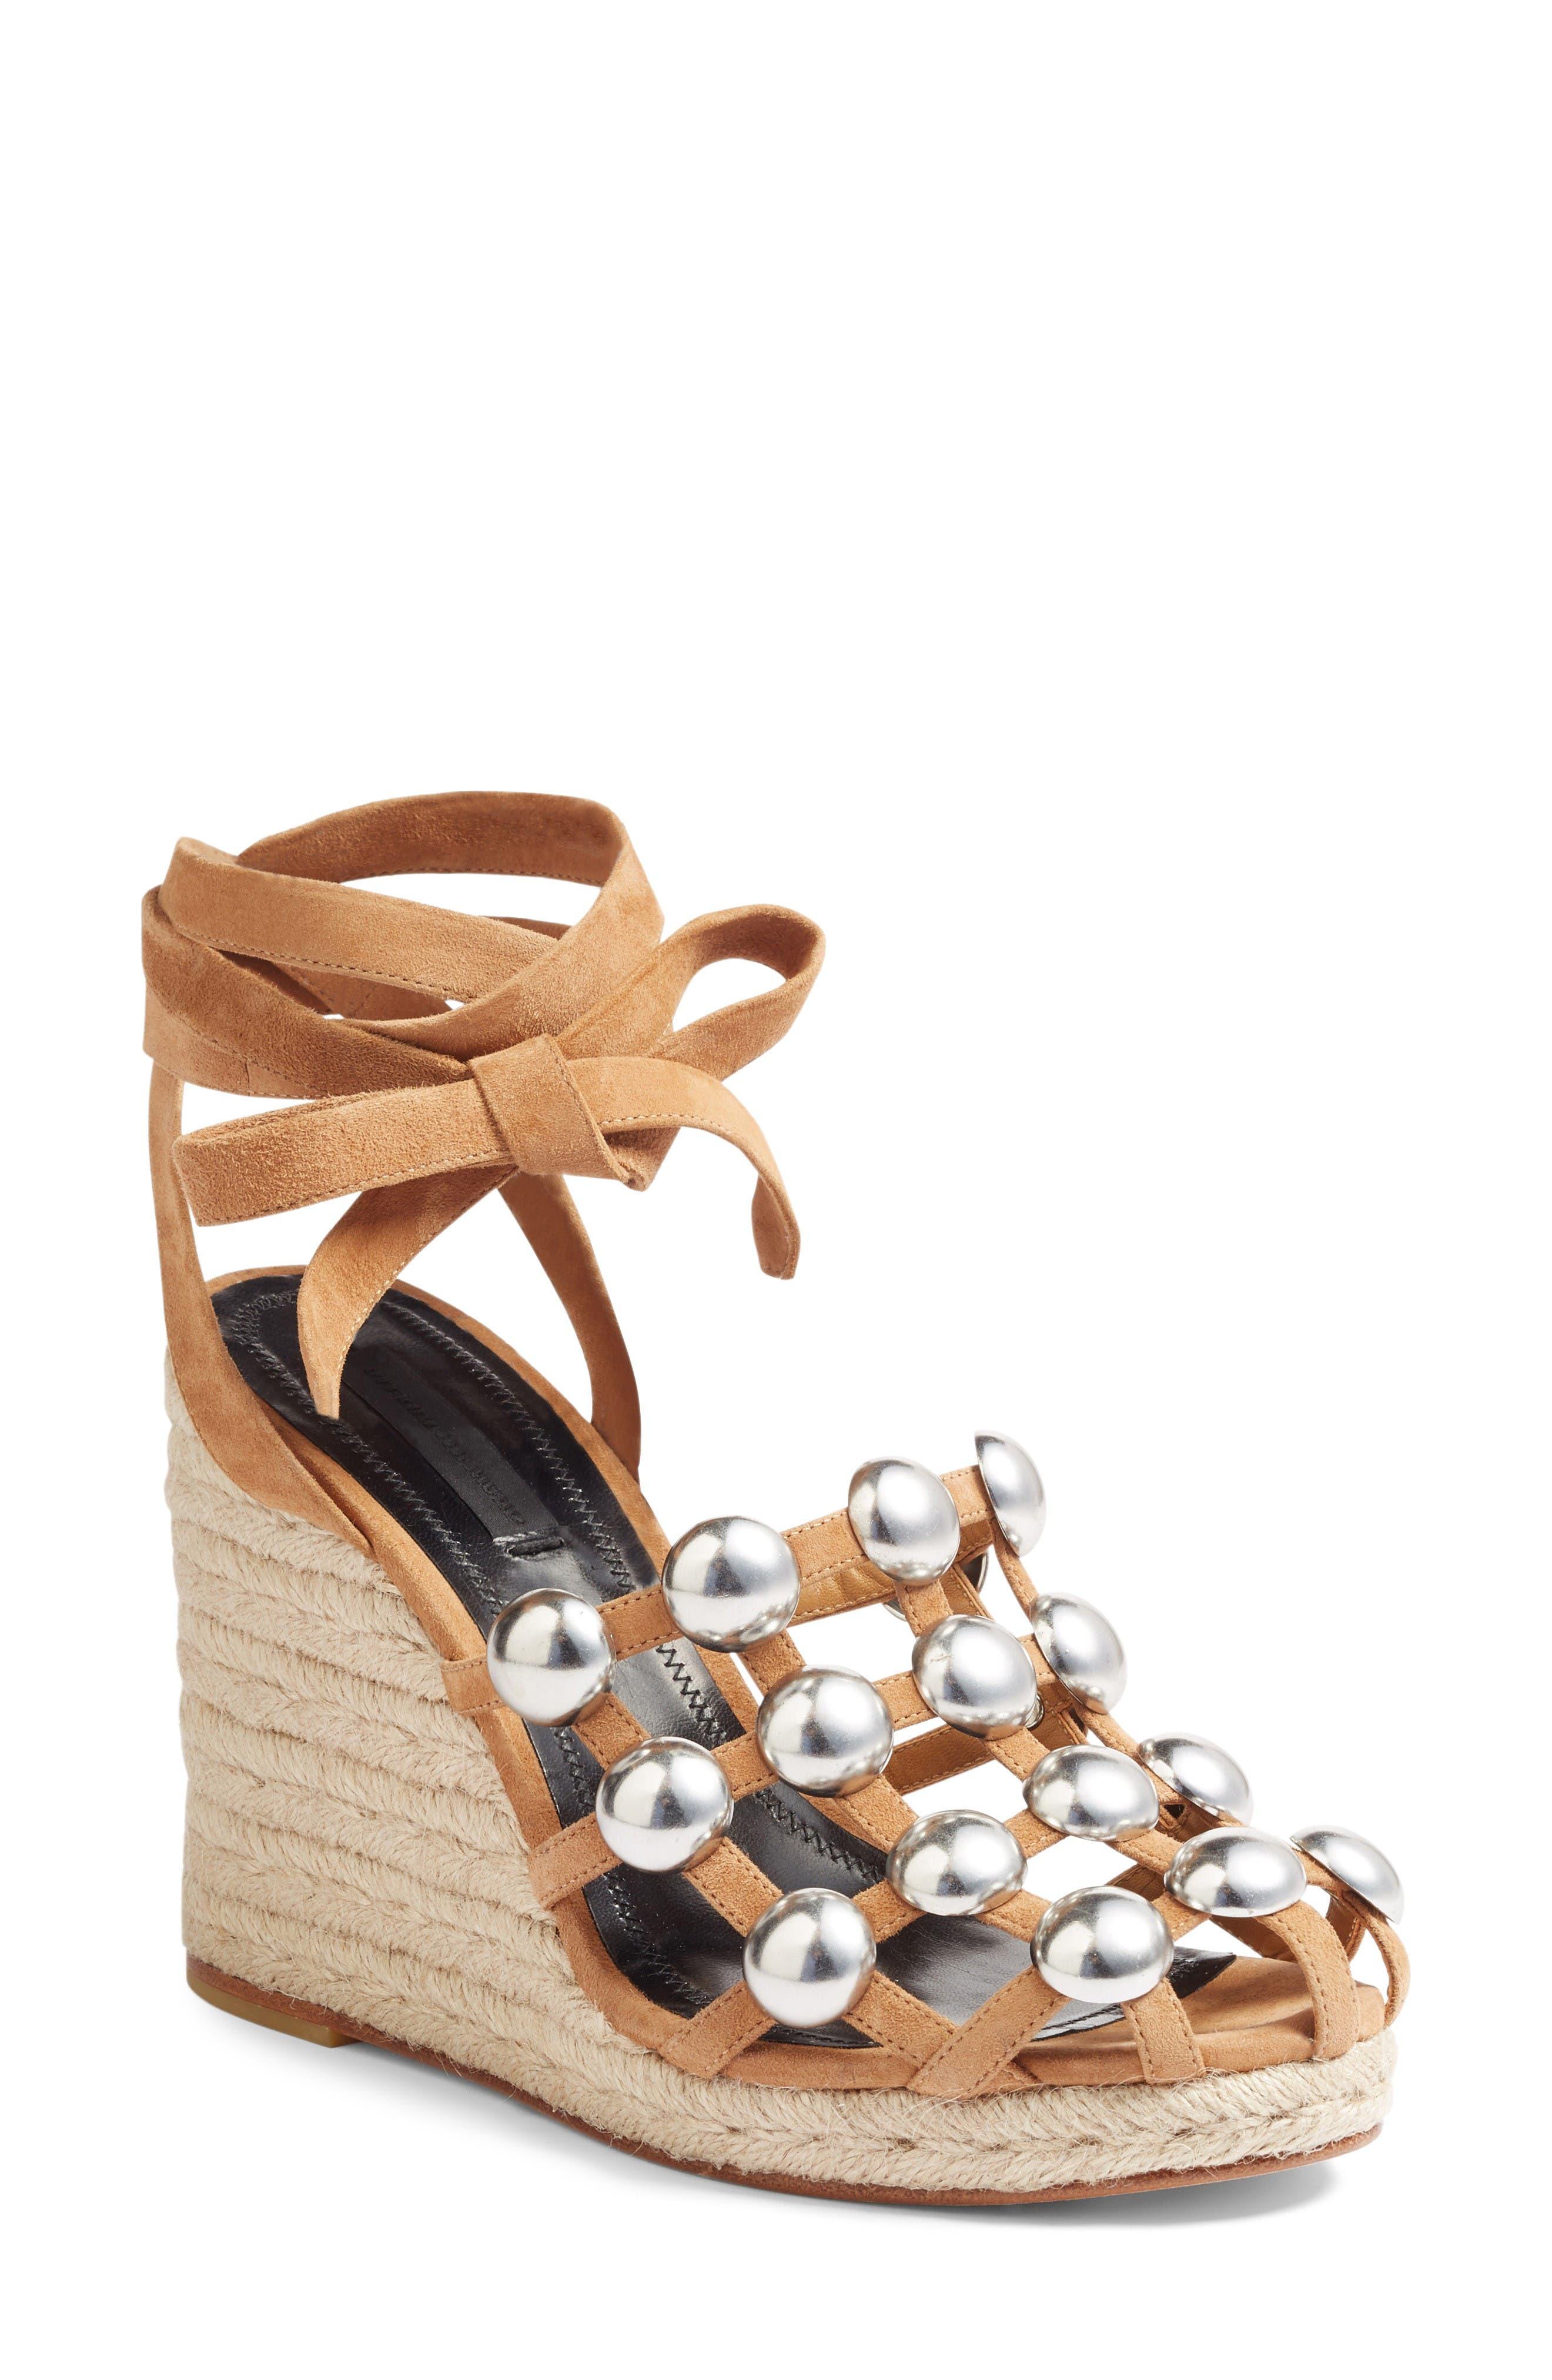 Main Image - Alexander Wang Taylor Stud Wedge Sandal (Women)